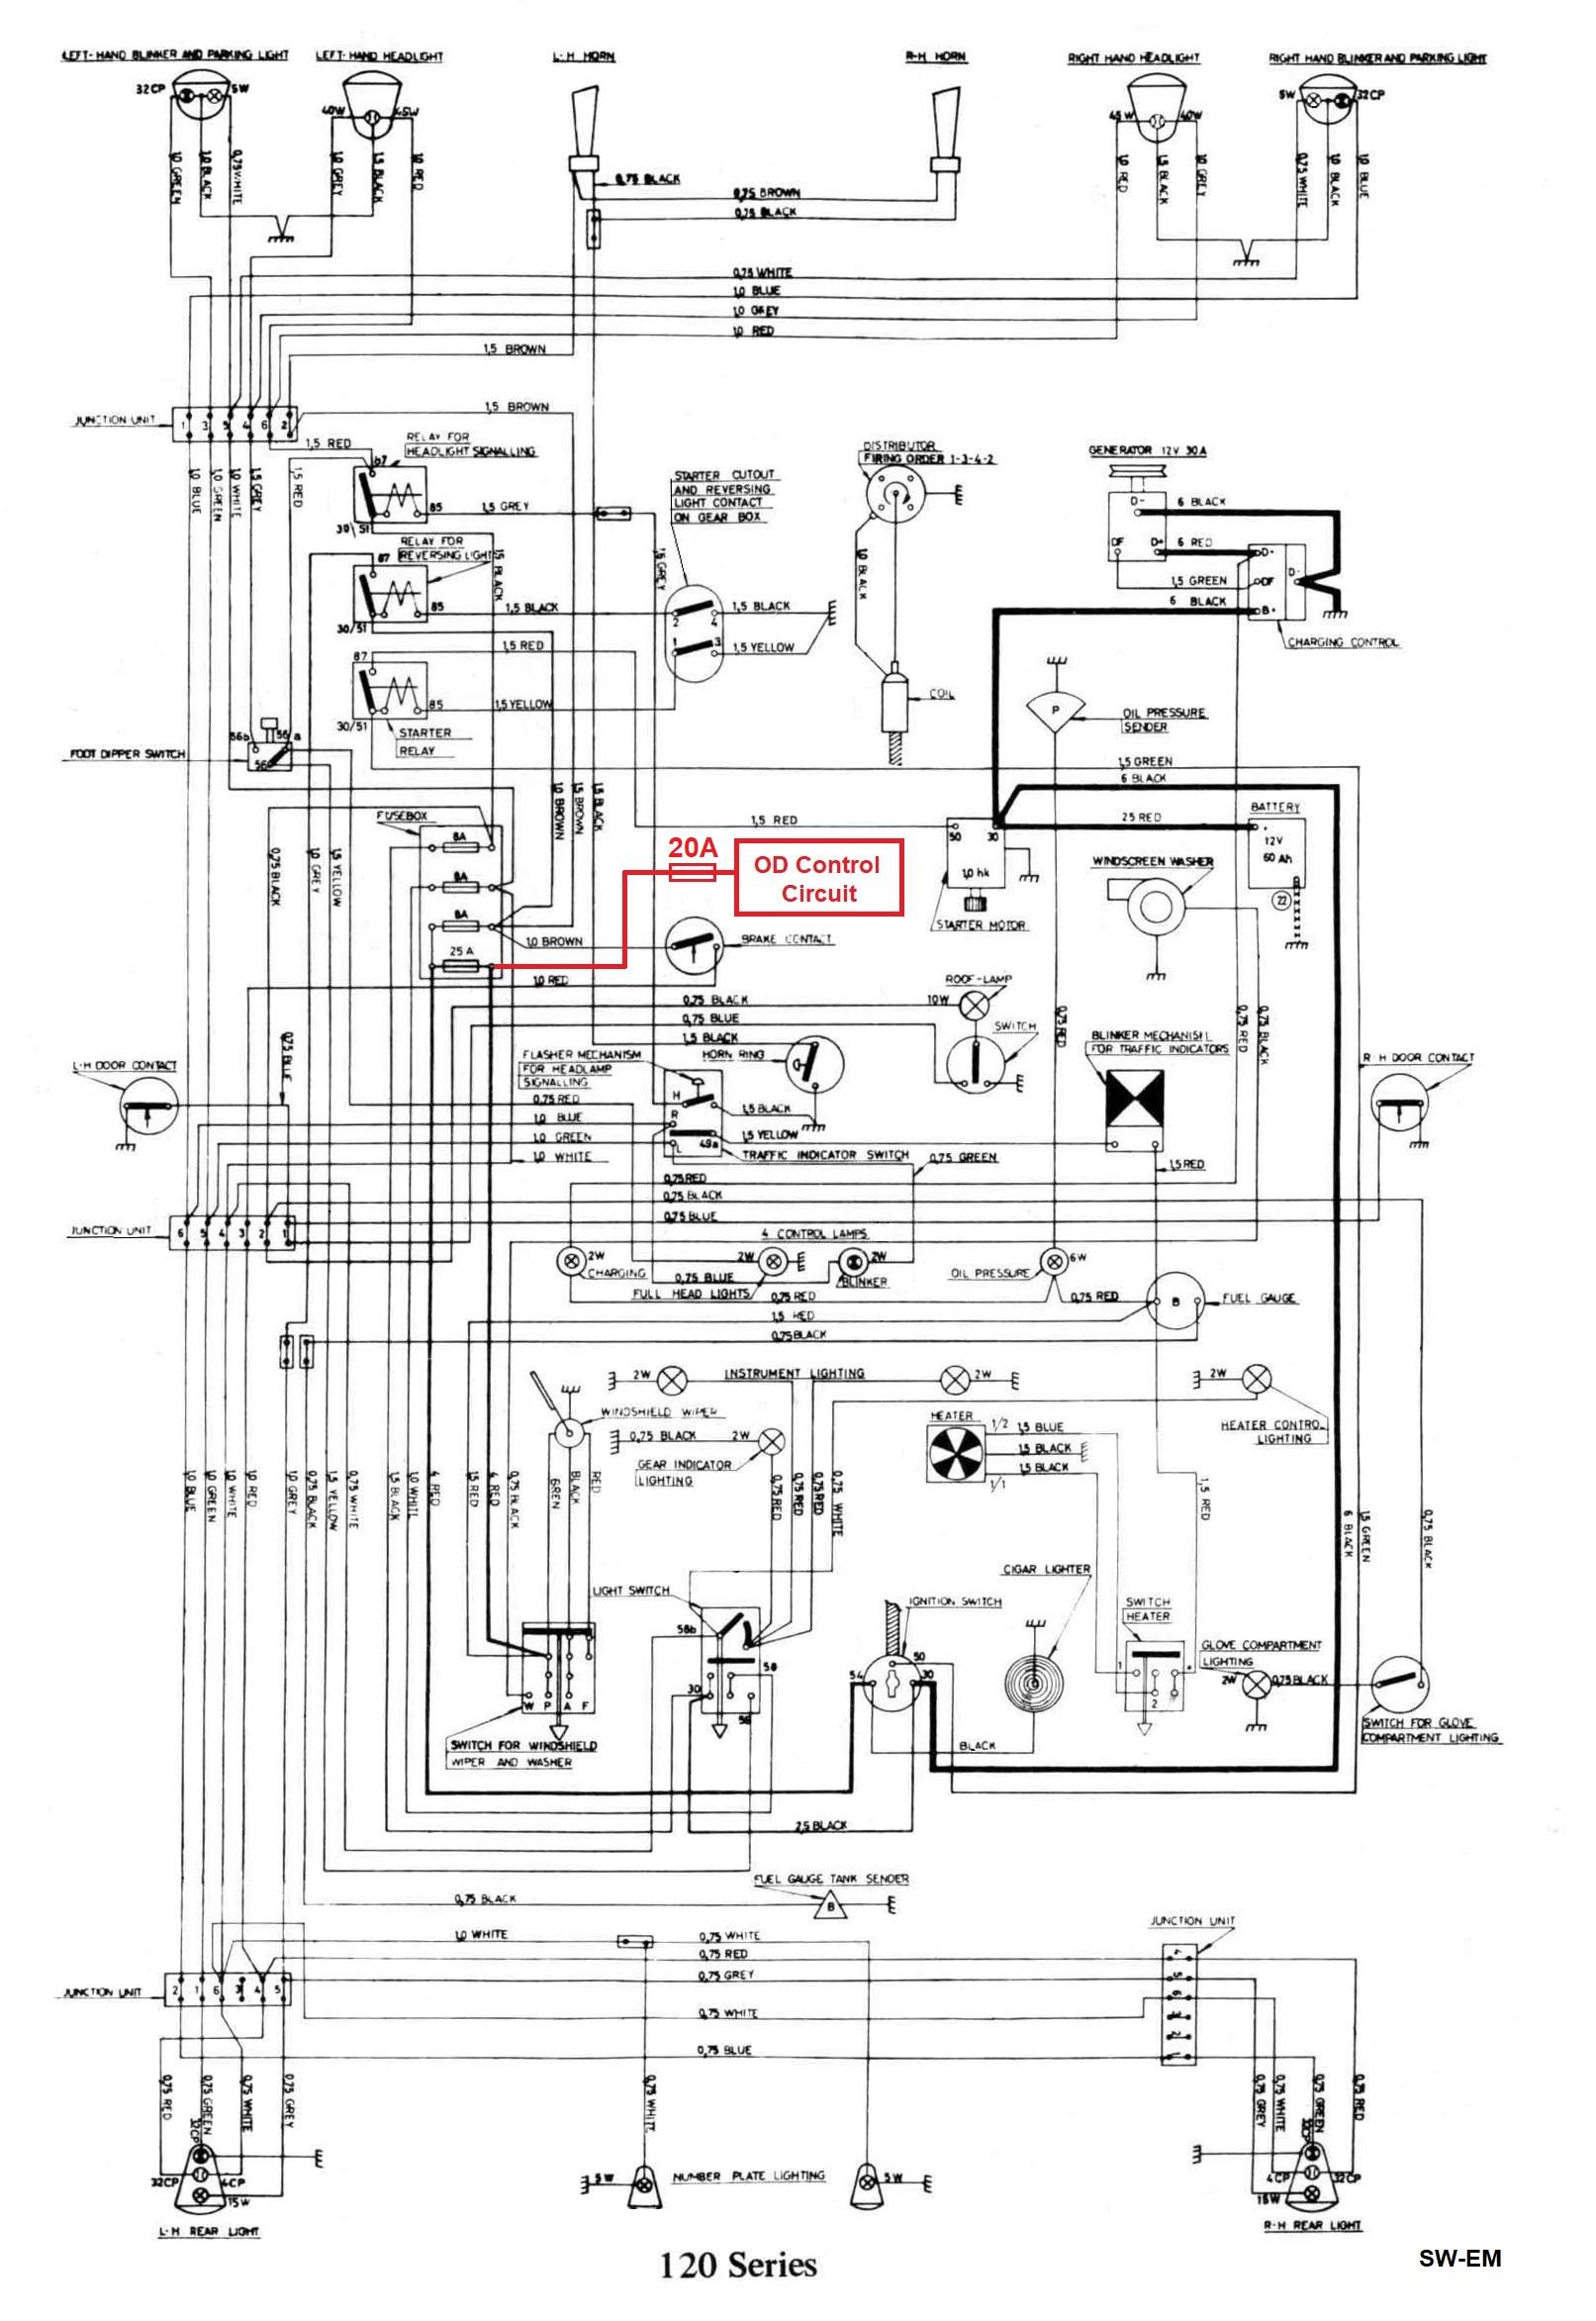 [DIAGRAM_38YU]  OS_2213] Volvo S60 Trailer Wiring Harness Download Diagram | Volvo S60 Wiring Diagrams |  | Cosa Favo Inrebe Mohammedshrine Librar Wiring 101